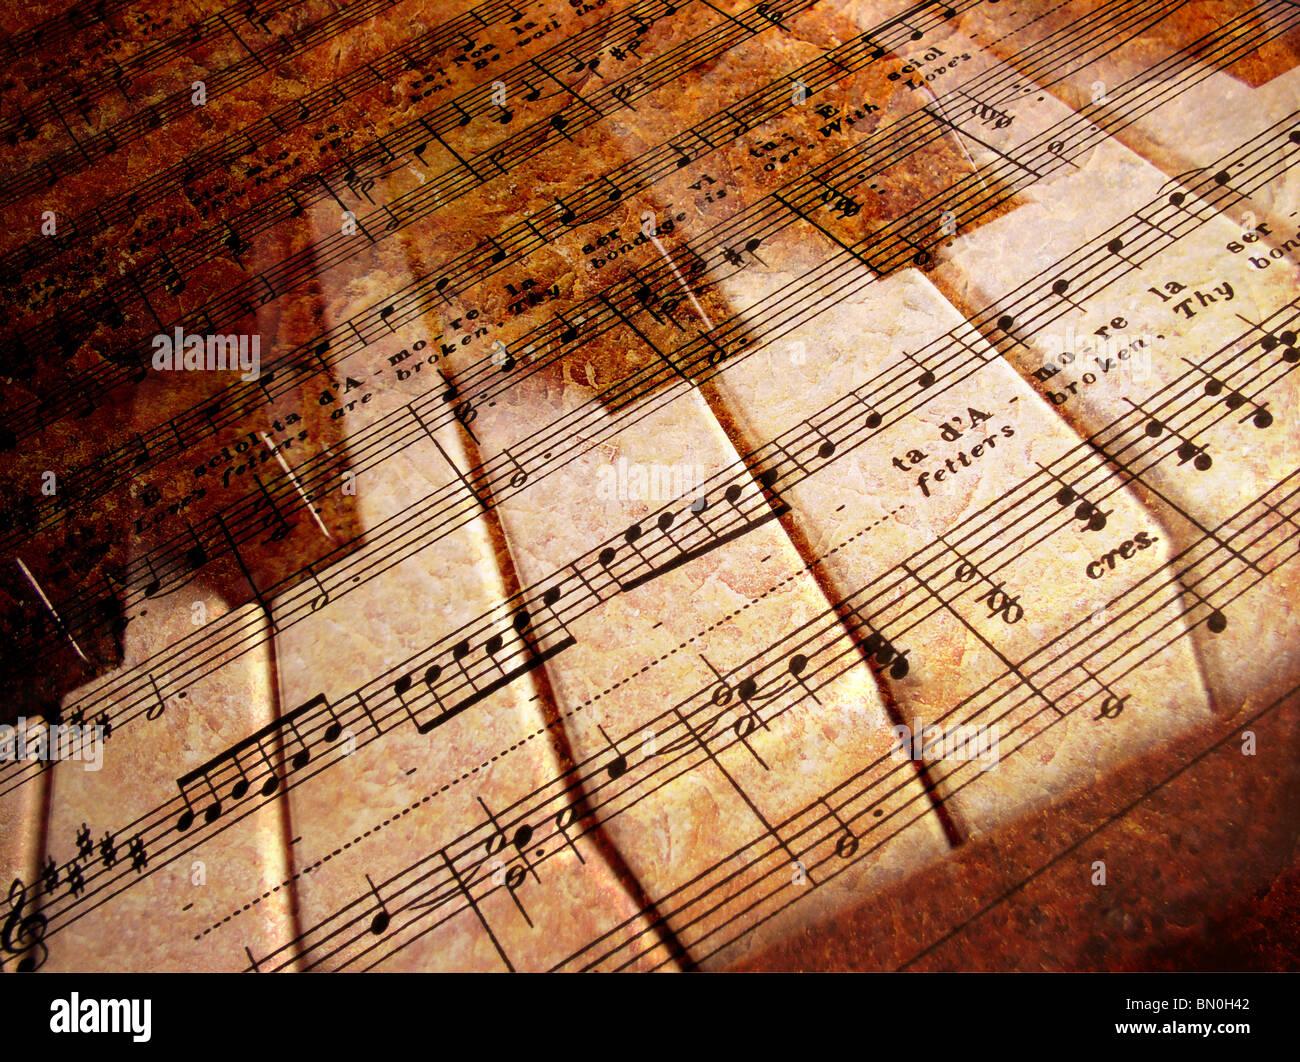 Sheet Music Photography